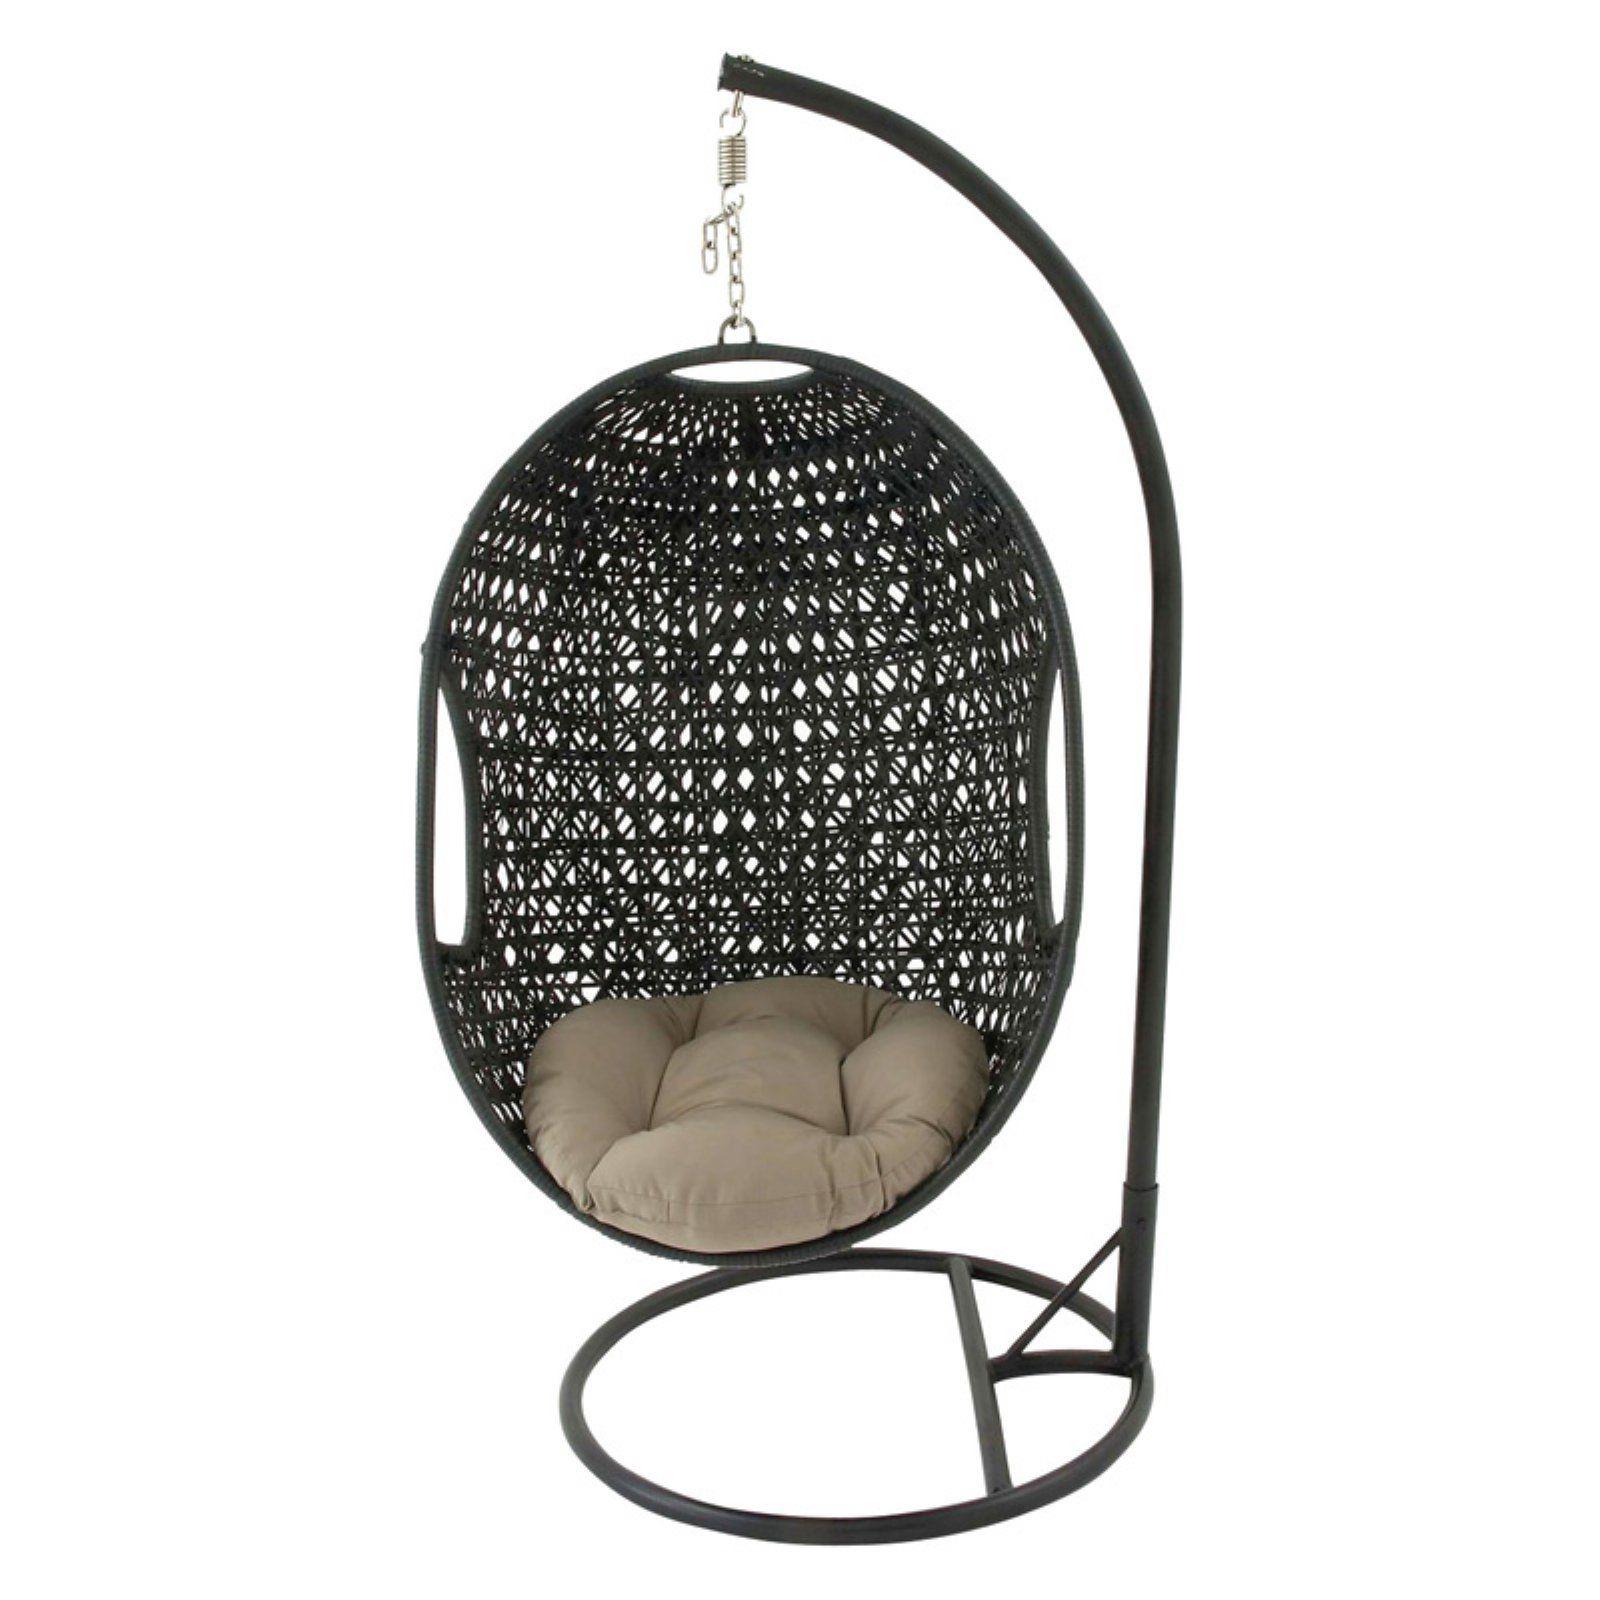 Outdoor DecMode Rattan Hanging Chair Hammock with Metal